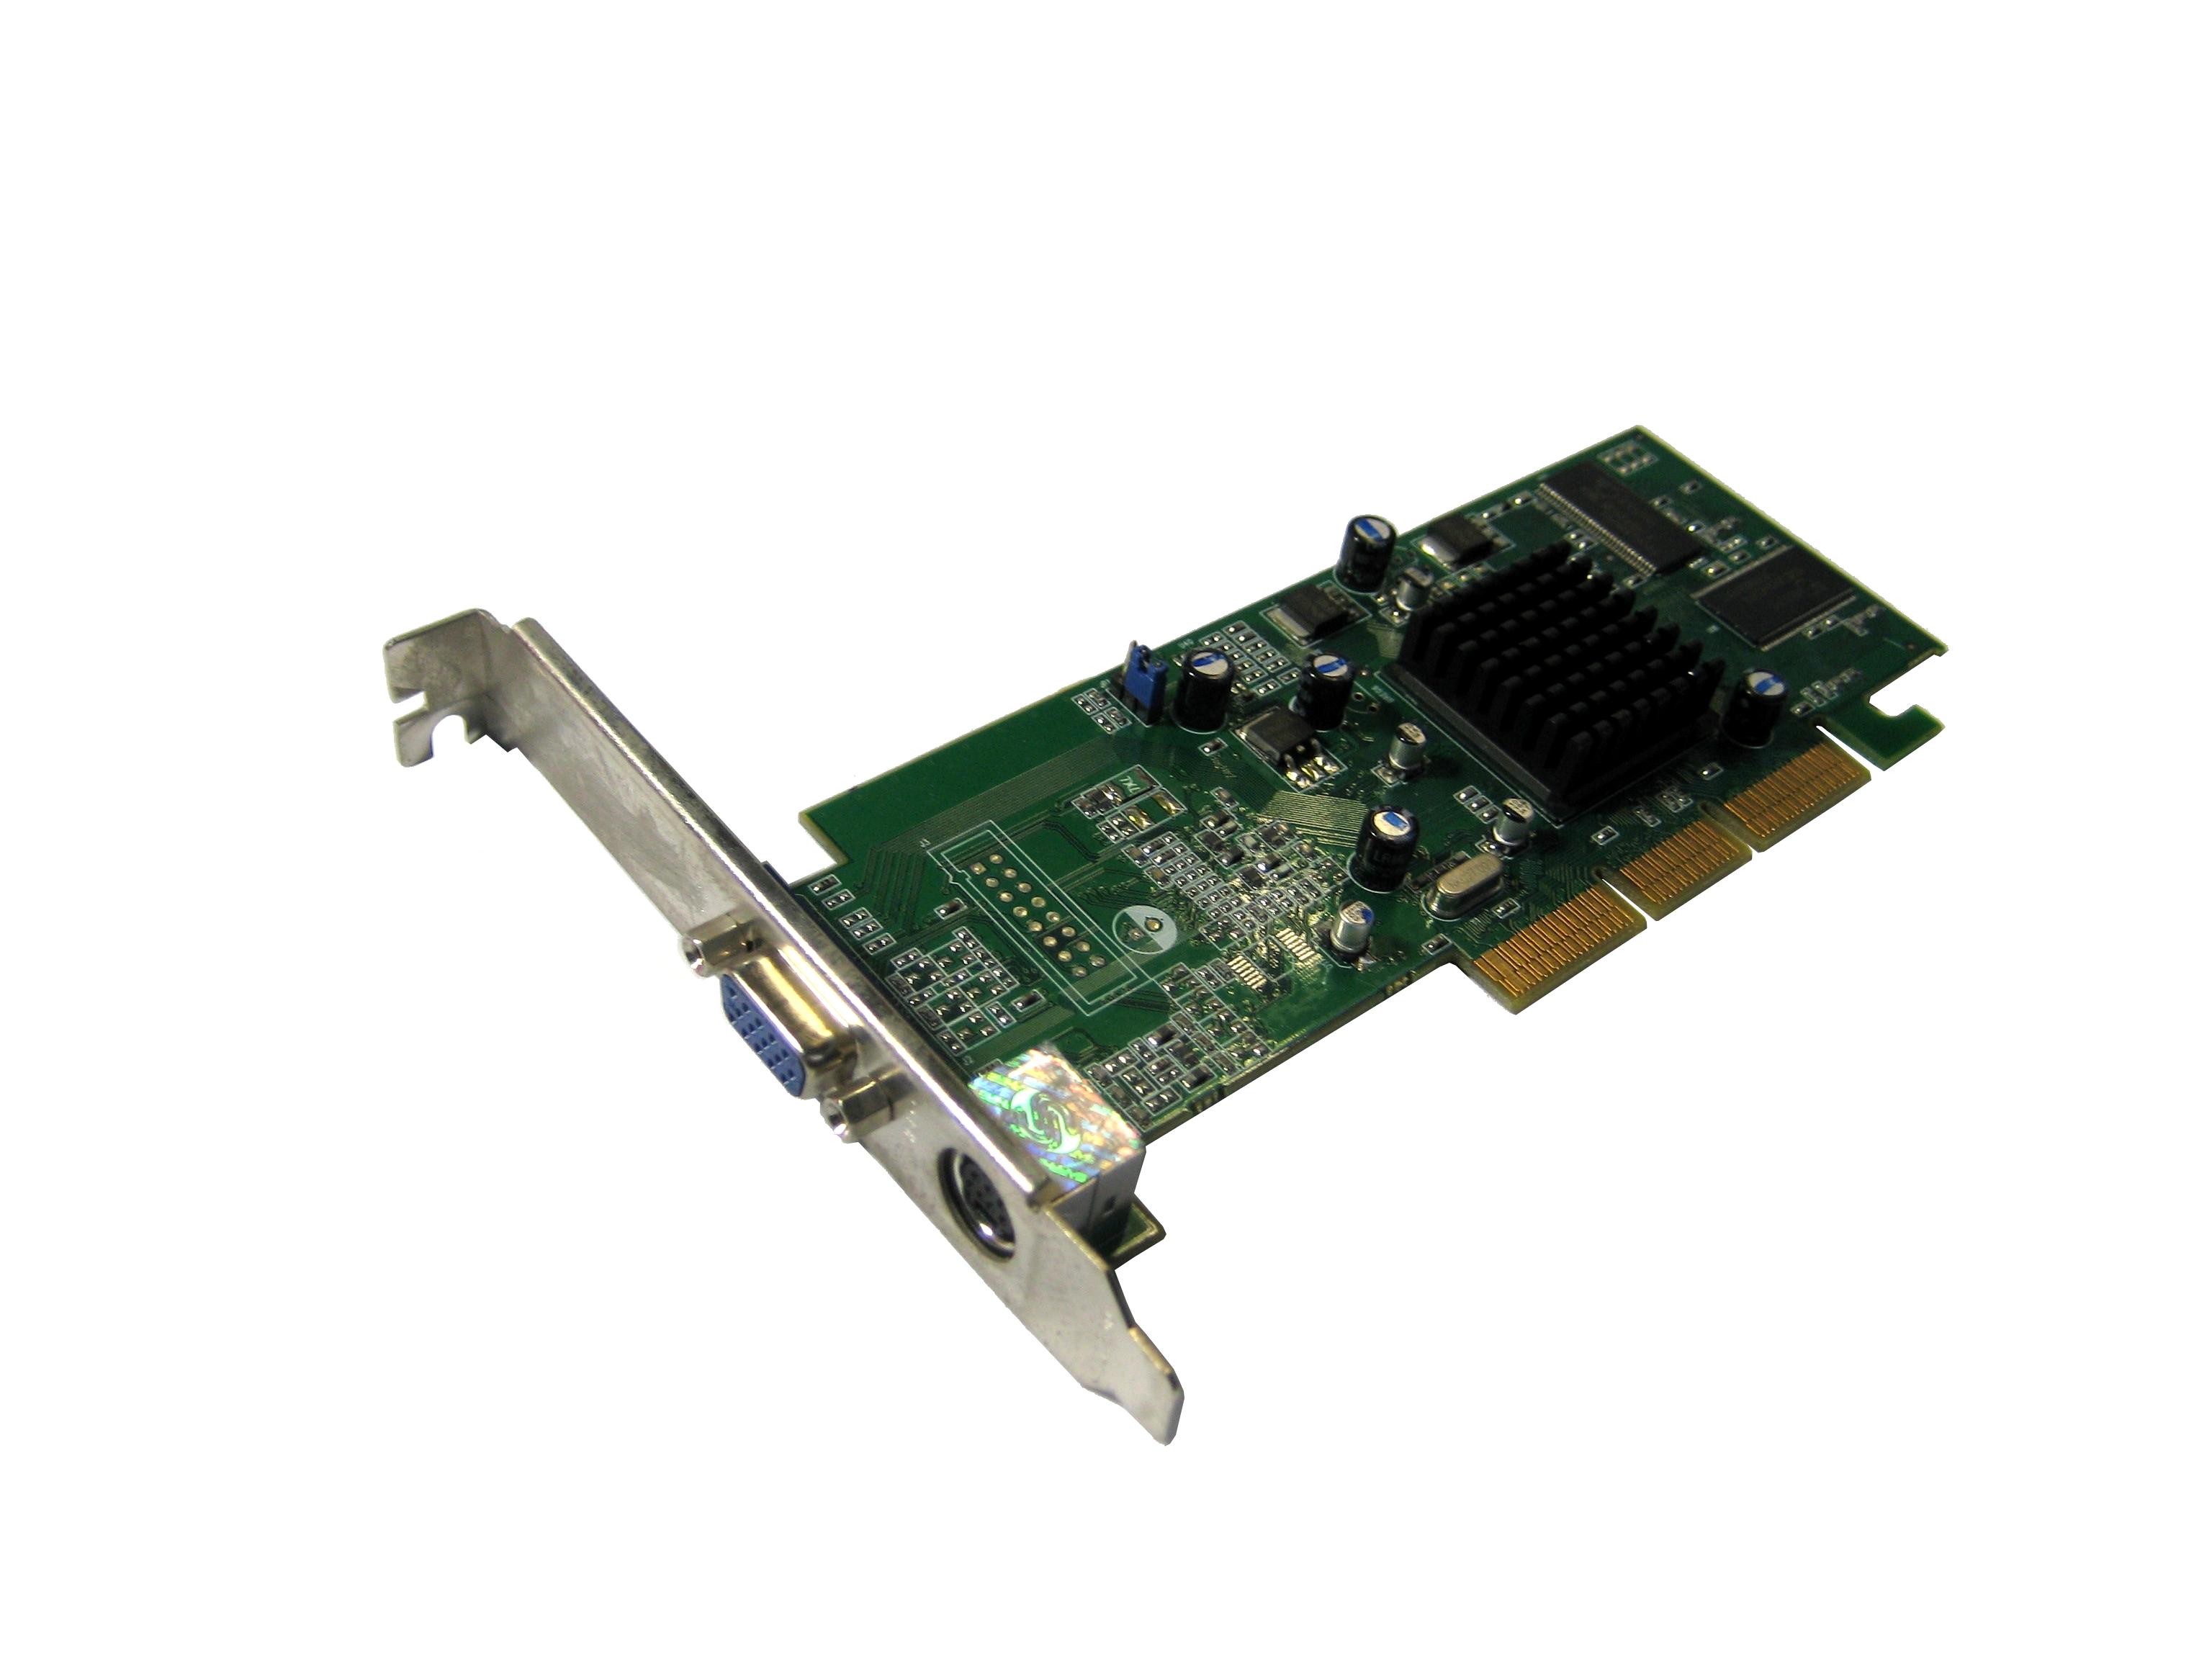 Sapphire 1024-2C28-A3-SA Radeon 7000 32MB DDR TVO AGP Card